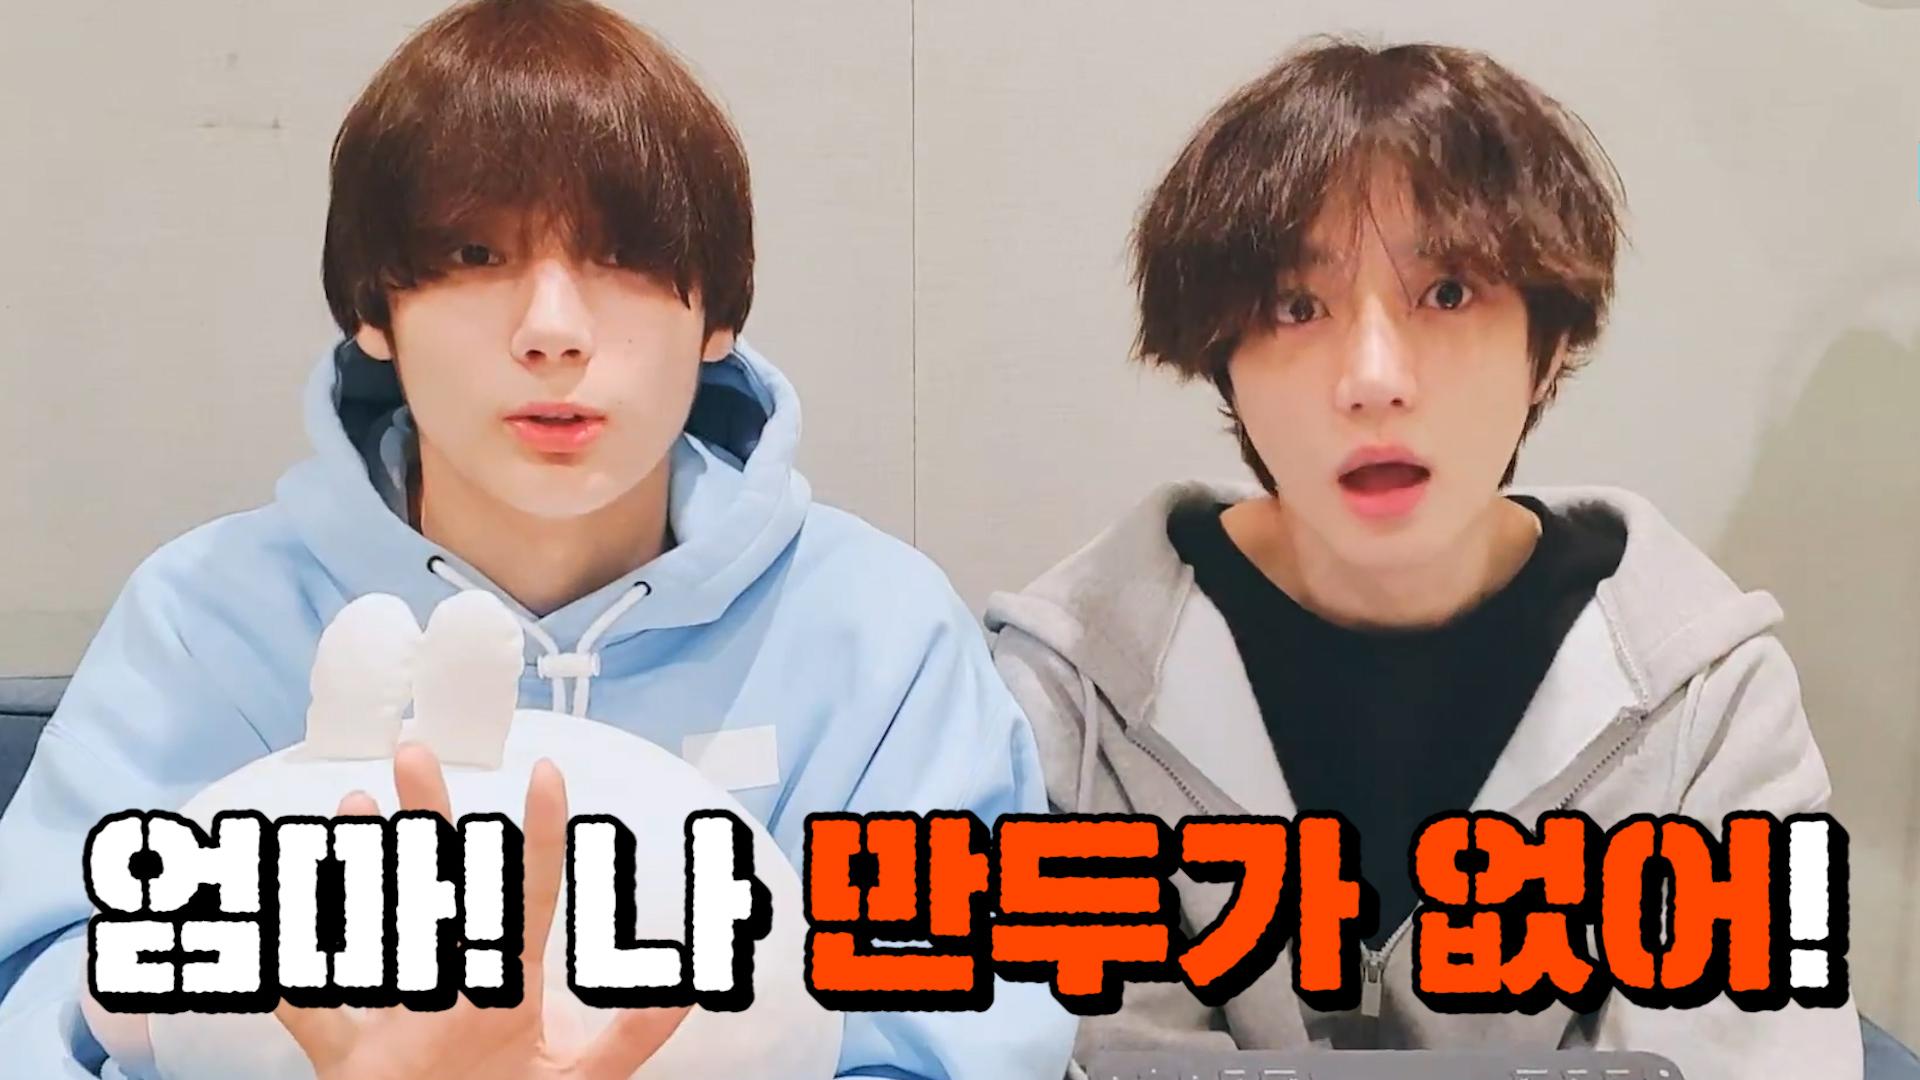 [TXT] 규카츠의 세상에서 가장 무서운 만두 이야기🥟👻 (BEOMGYU&HUENINGKAI talking about scary dumpling story)